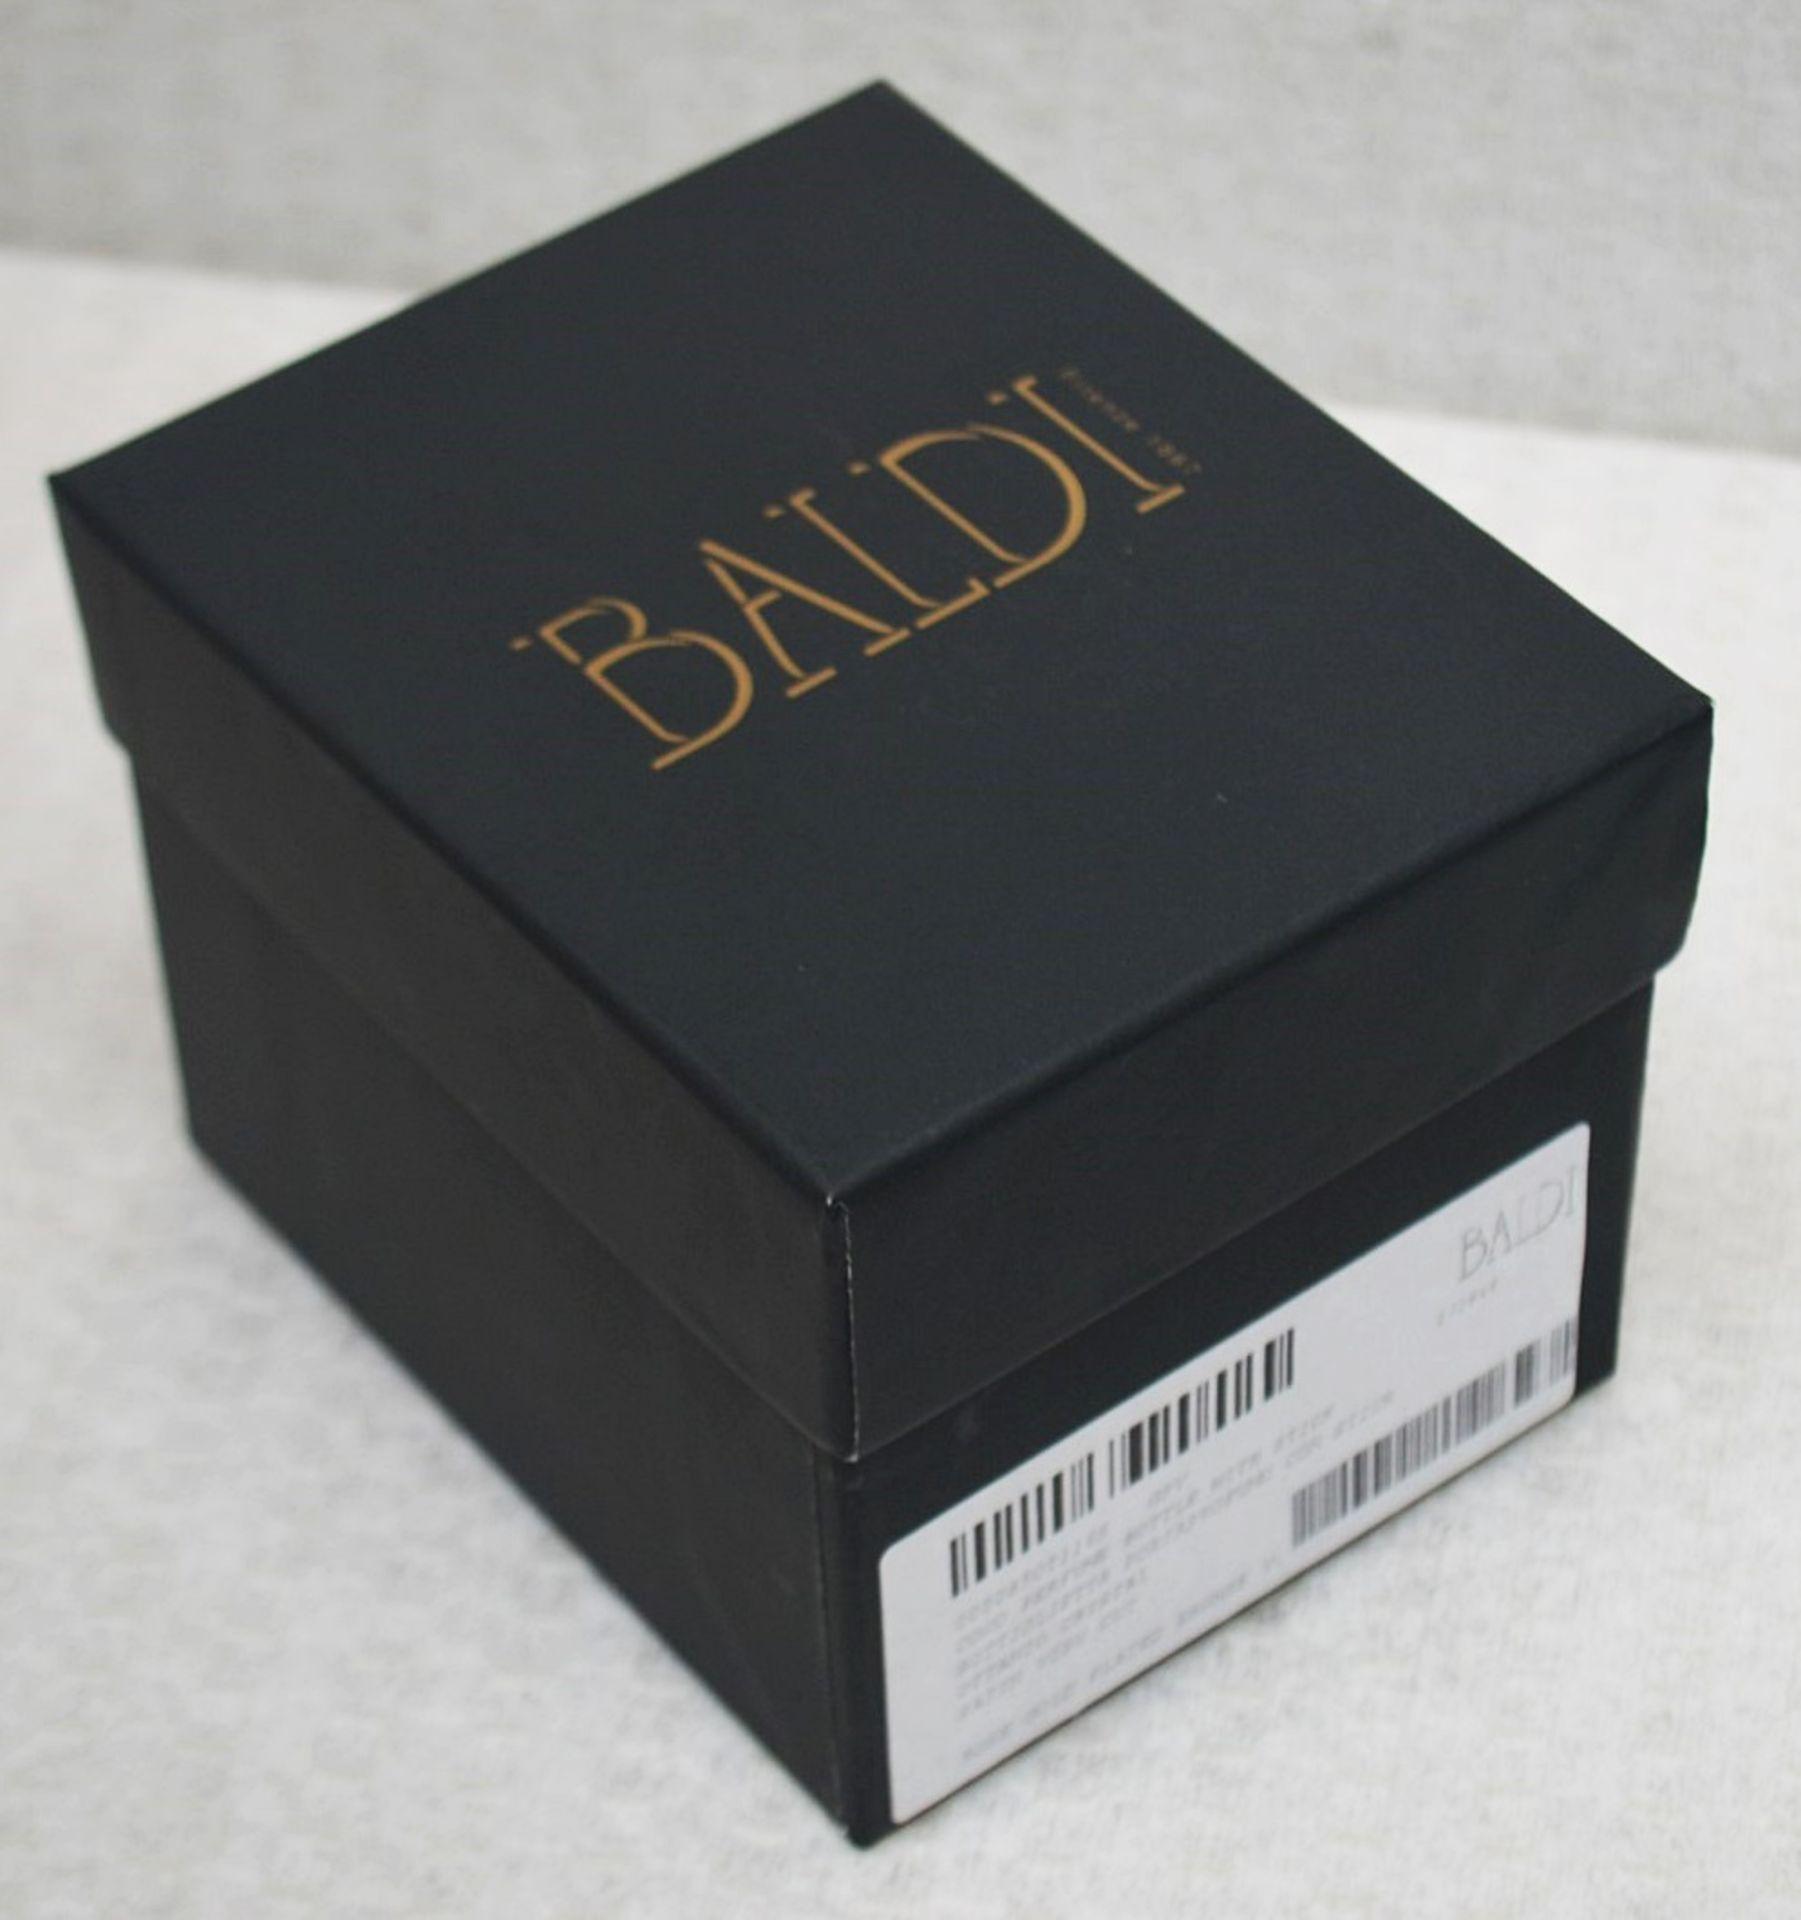 1 x BALDI 'Home Jewels' Italian Hand-crafted Artisan Ottanio Crystal Perfume Bottle & Stick - - Image 5 of 6